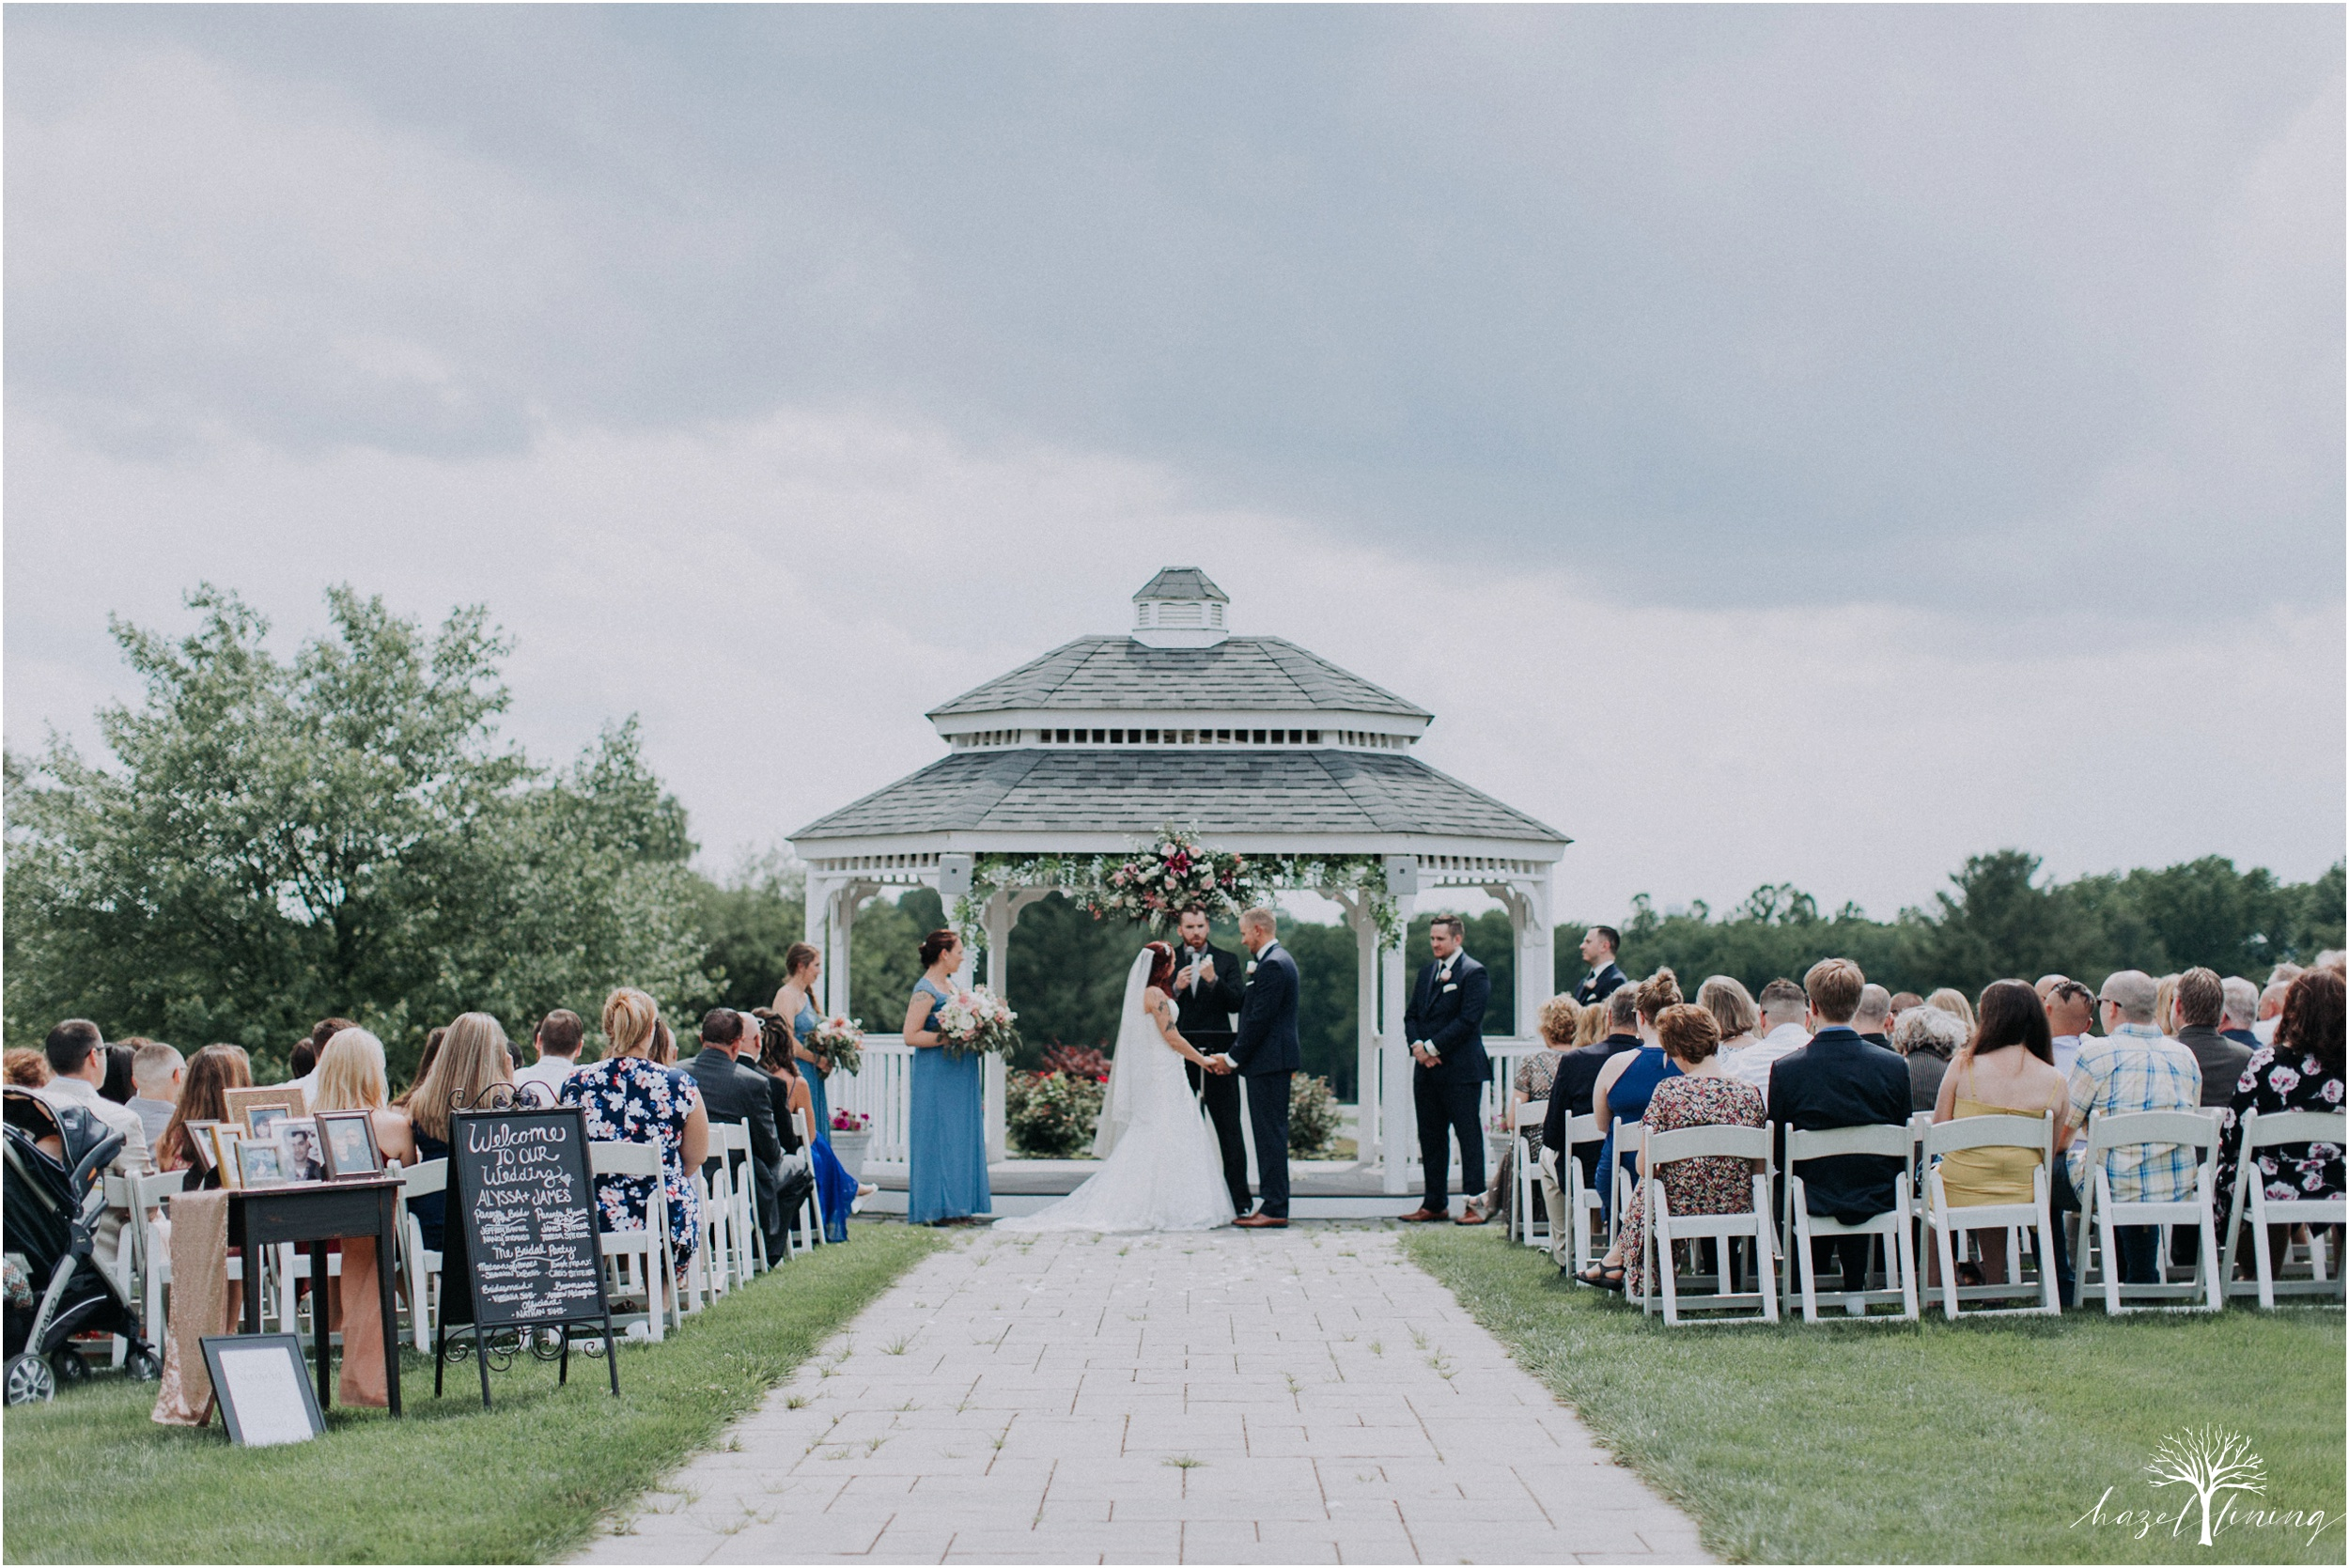 alyssa-james-stiteler-wedding-loft-and-sweet-water-cc-pennsburg-pennsylvania-hazel-lining-travel-wedding-elopement-photography_0054.jpg